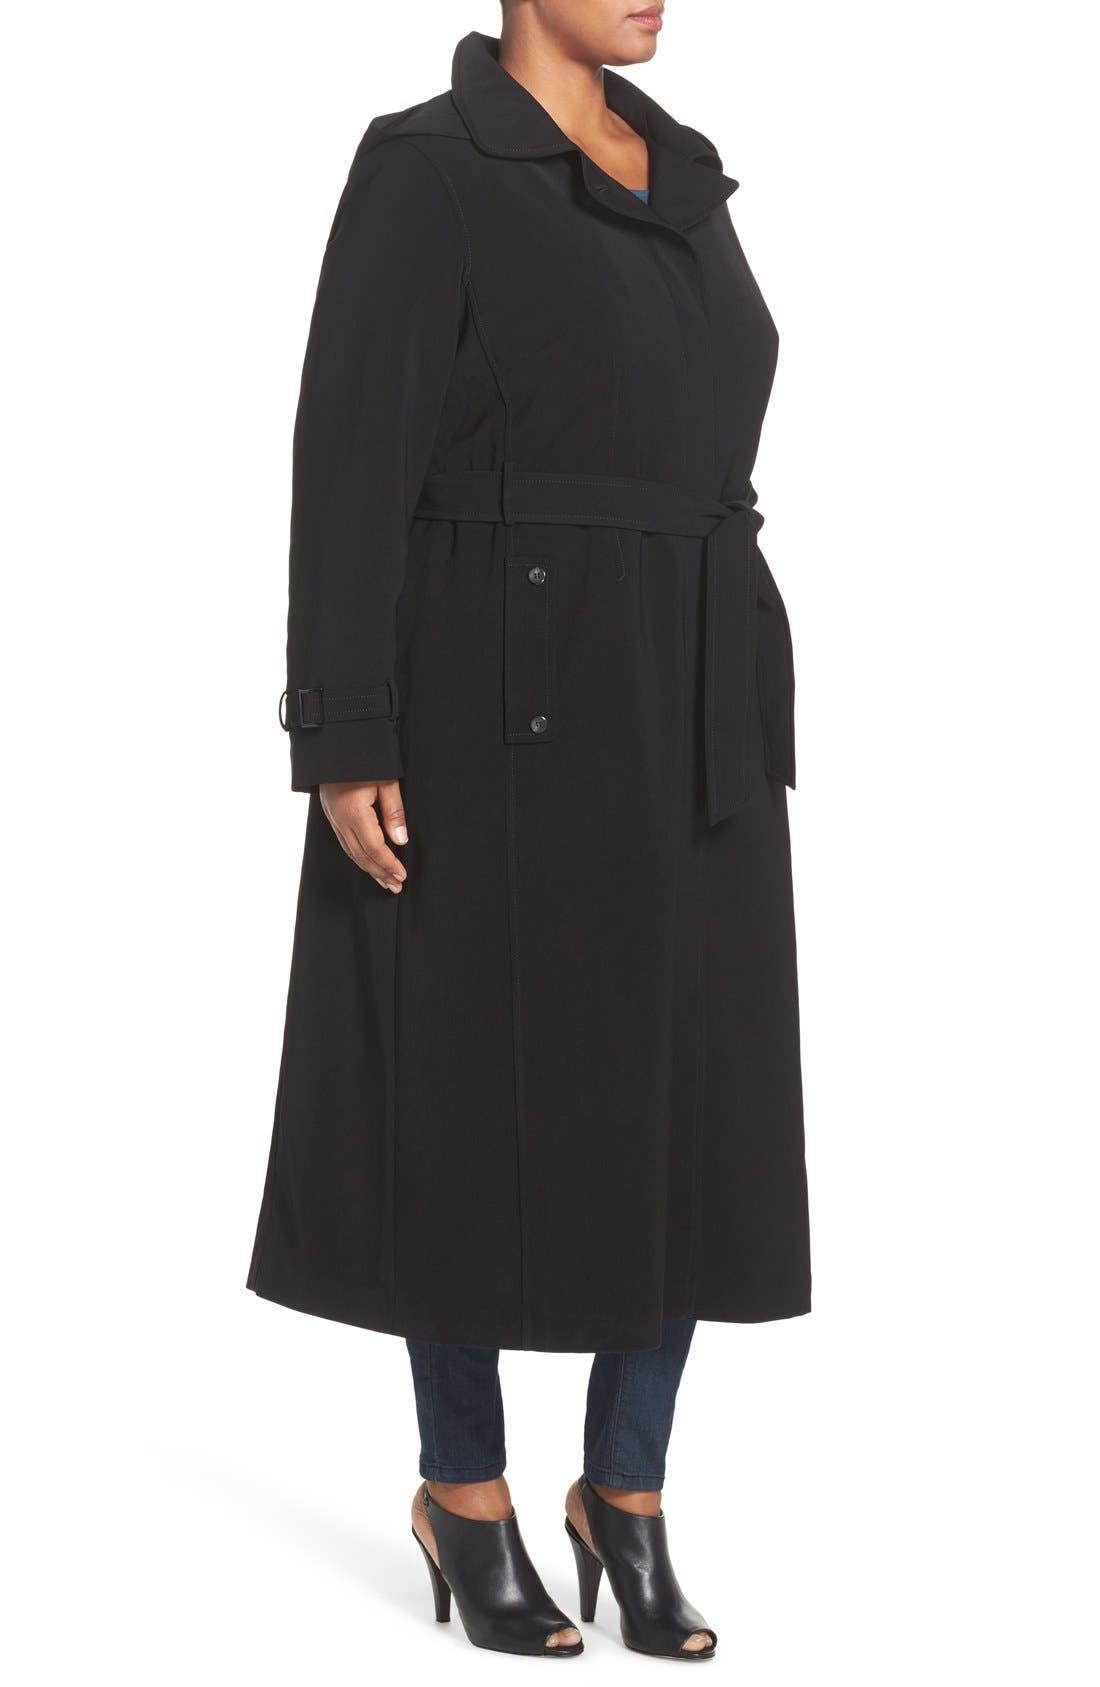 Long Nepage Raincoat with Detachable Hood & Liner,                             Alternate thumbnail 3, color,                             Black